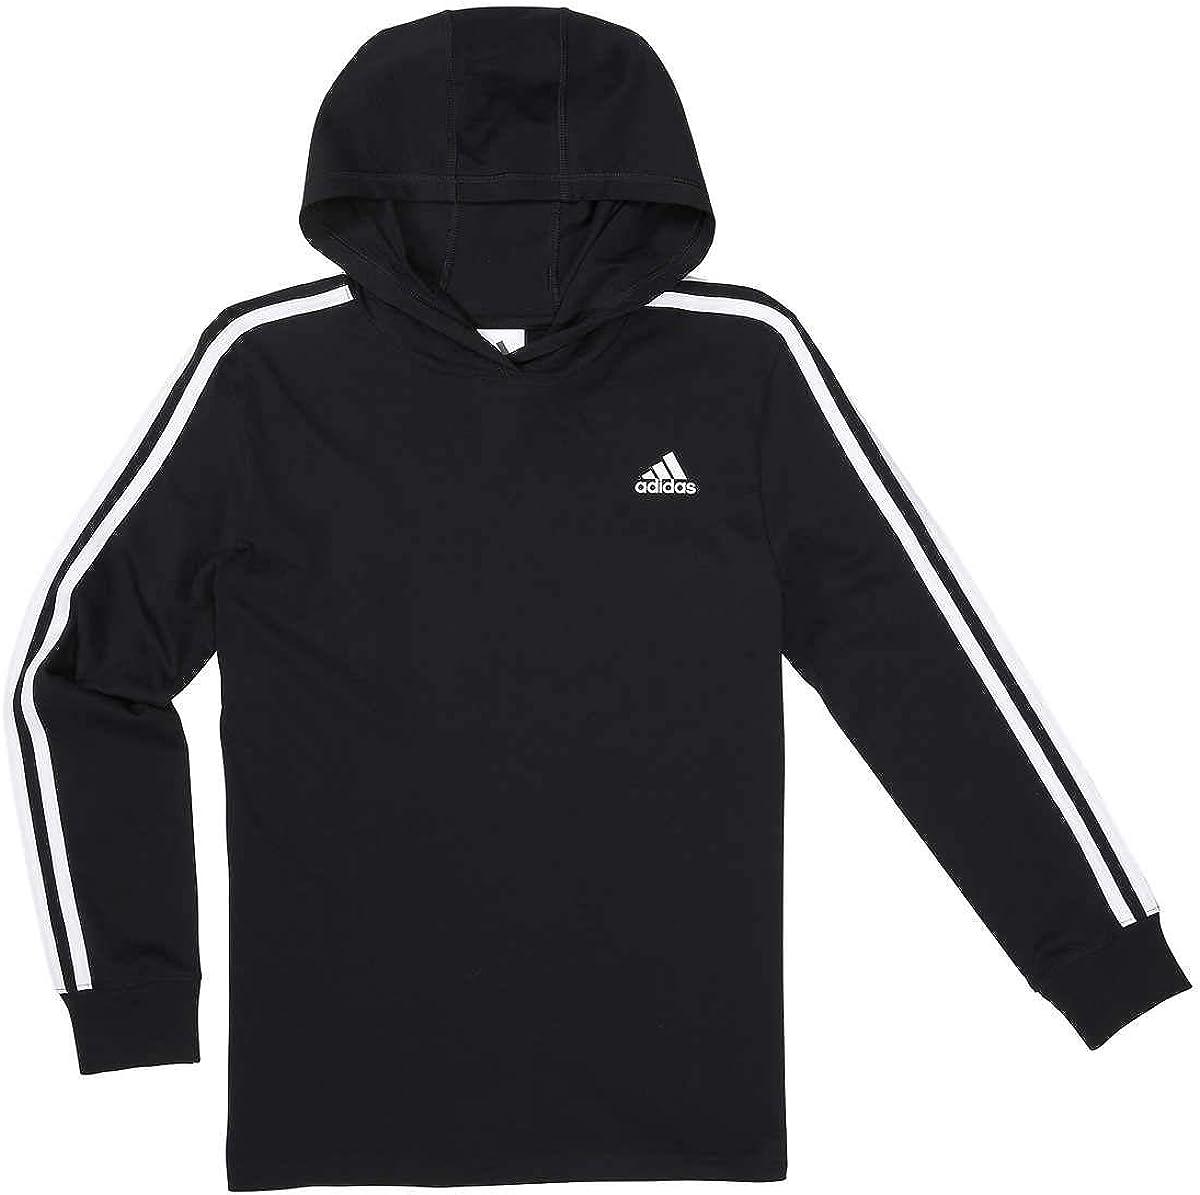 adidas Youth 3 Stripe Hooded Tee